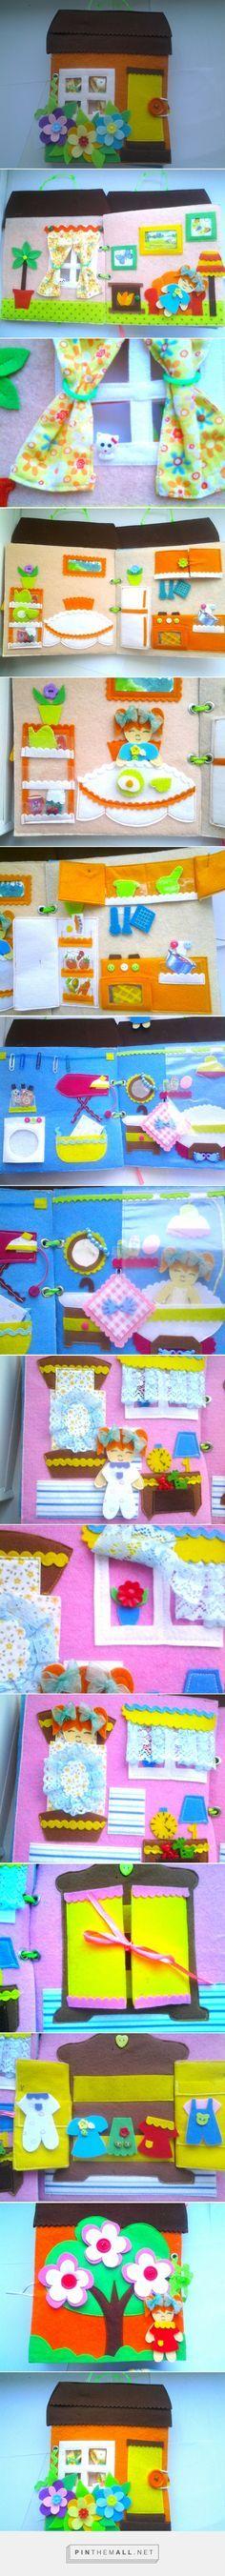 Домик - Babyblog.ru - created via http://pinthemall.net